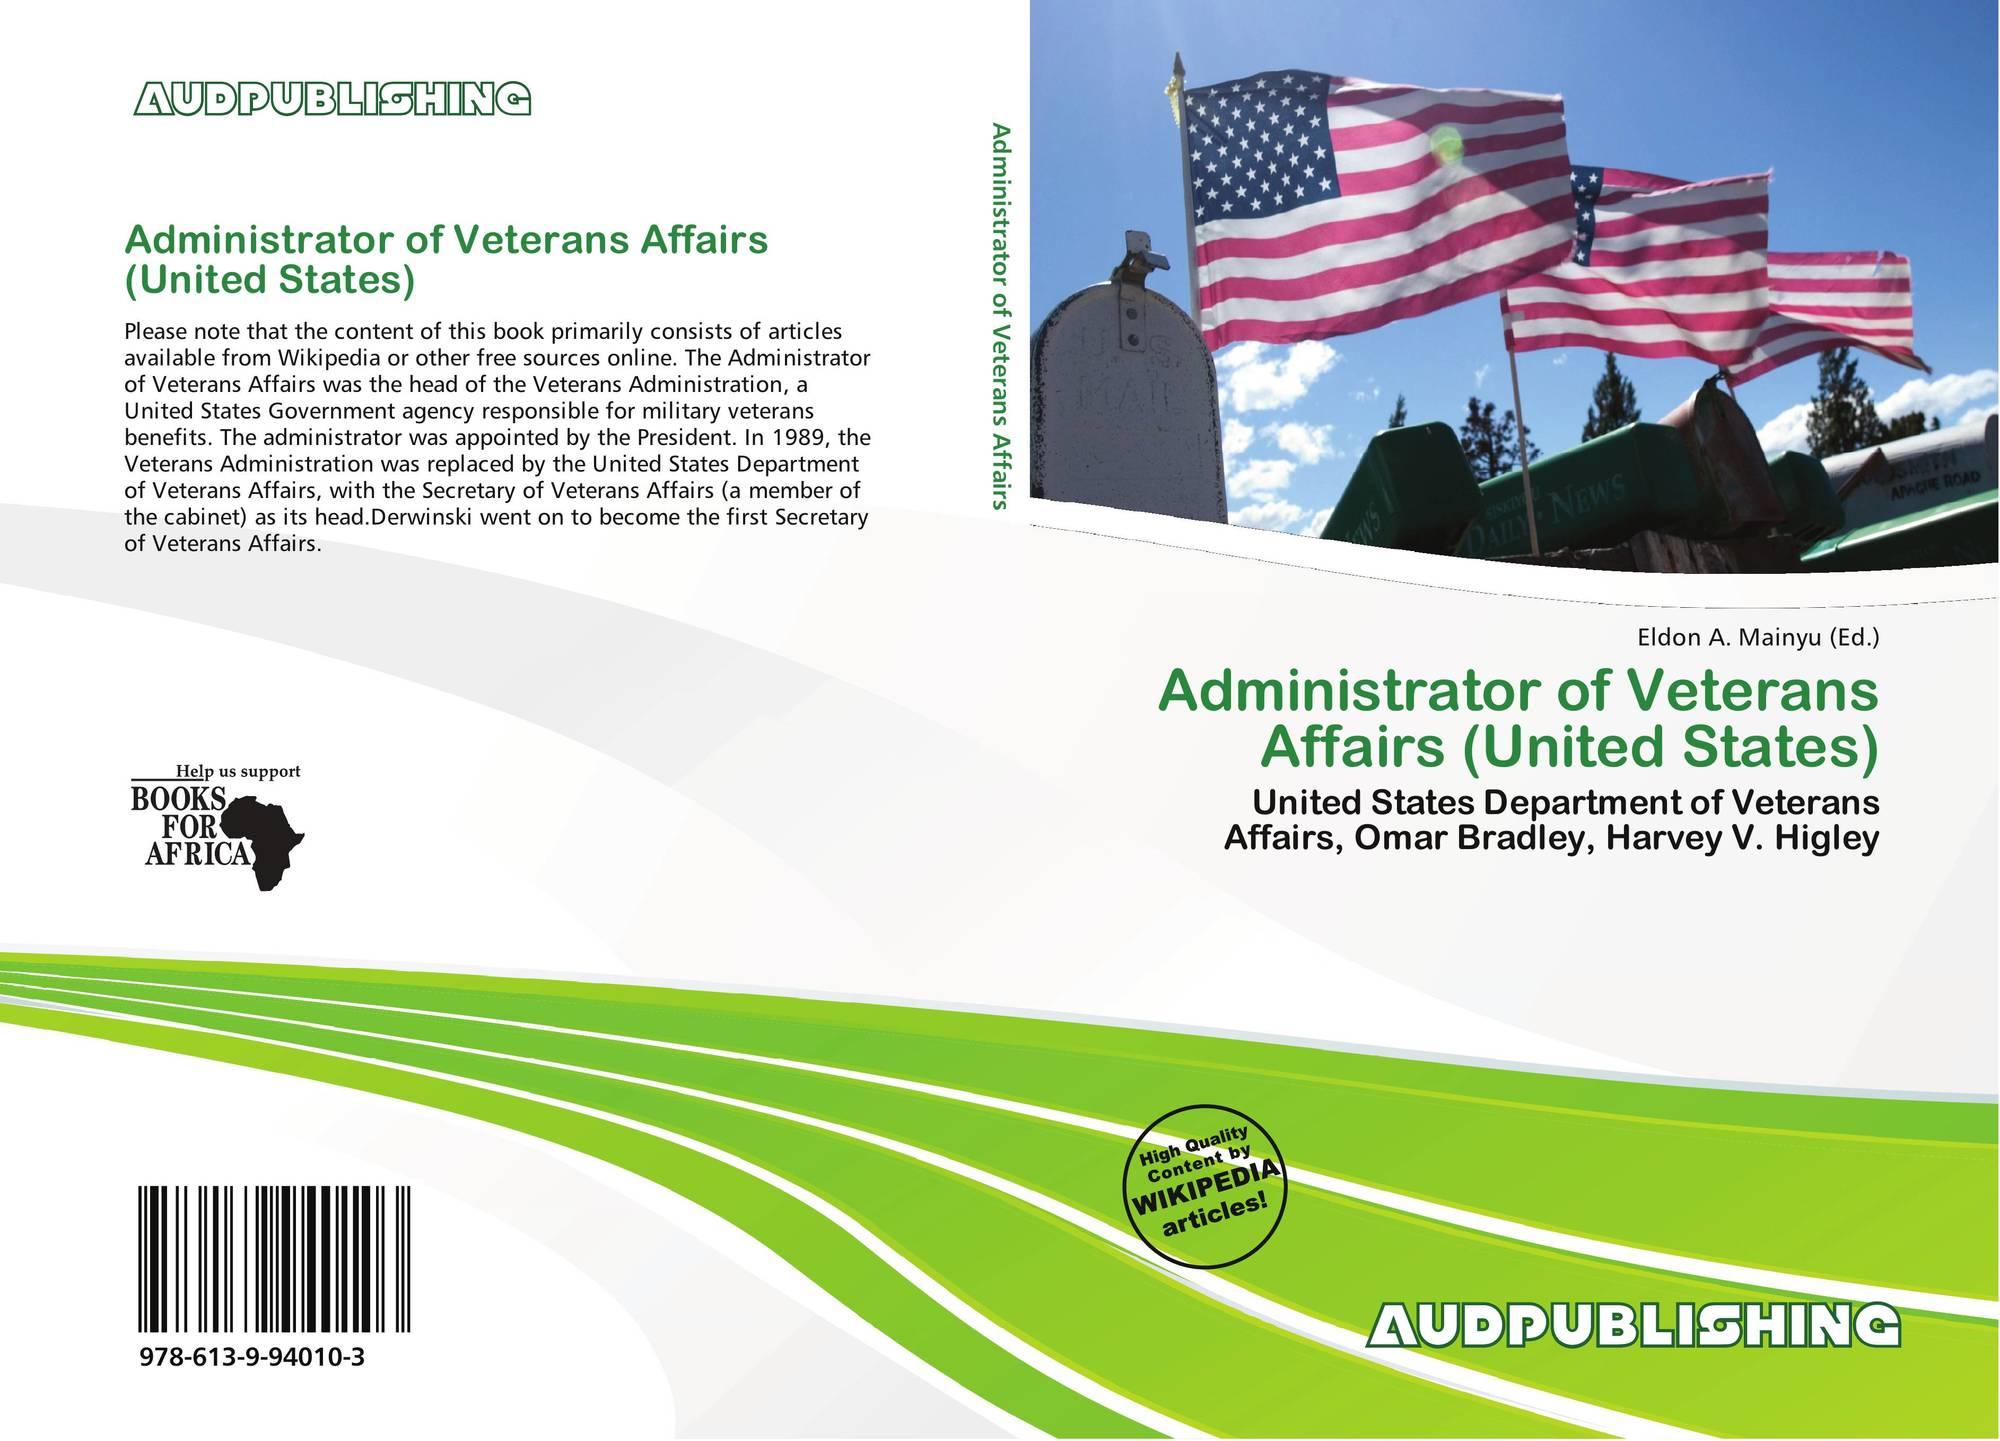 Administrator of Veterans Affairs (United States), 978-613-9